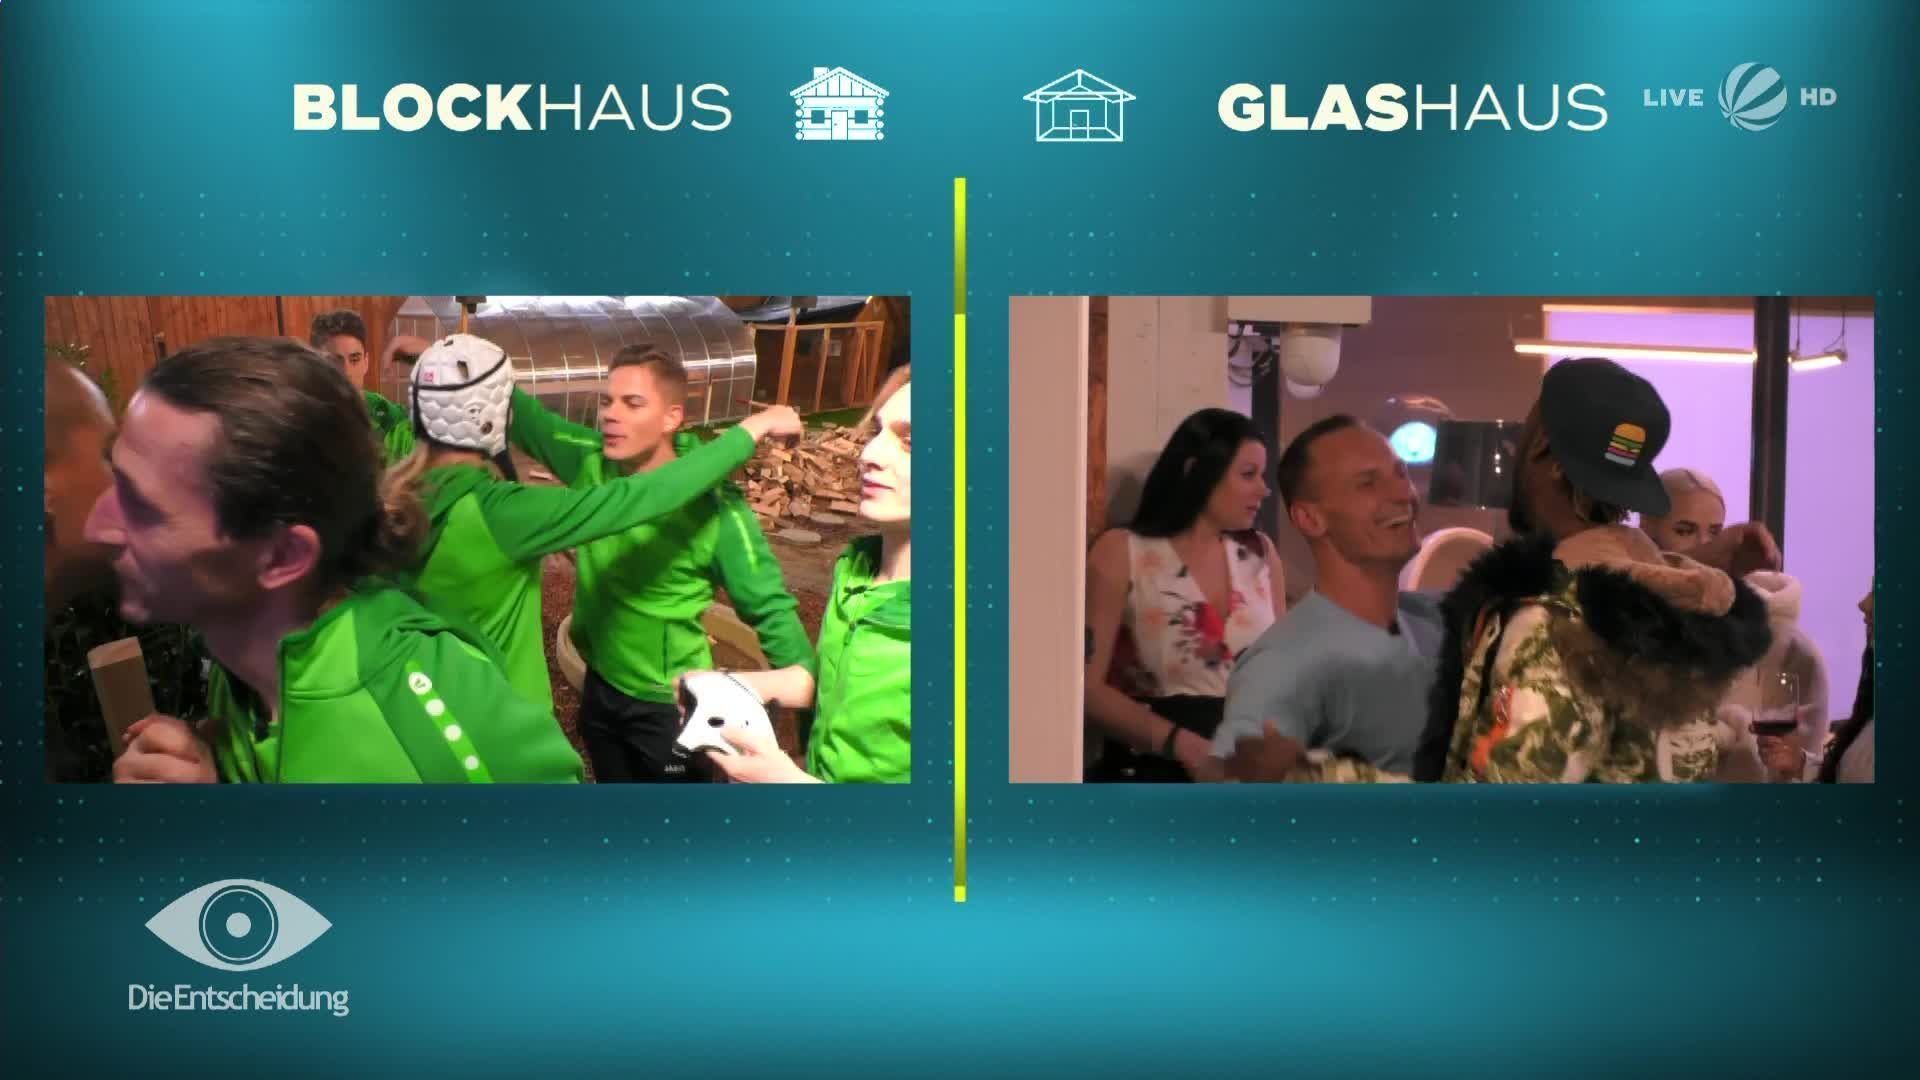 mareike_denny_big brother_big brother haus_glashaus_bewohner_blockhaus